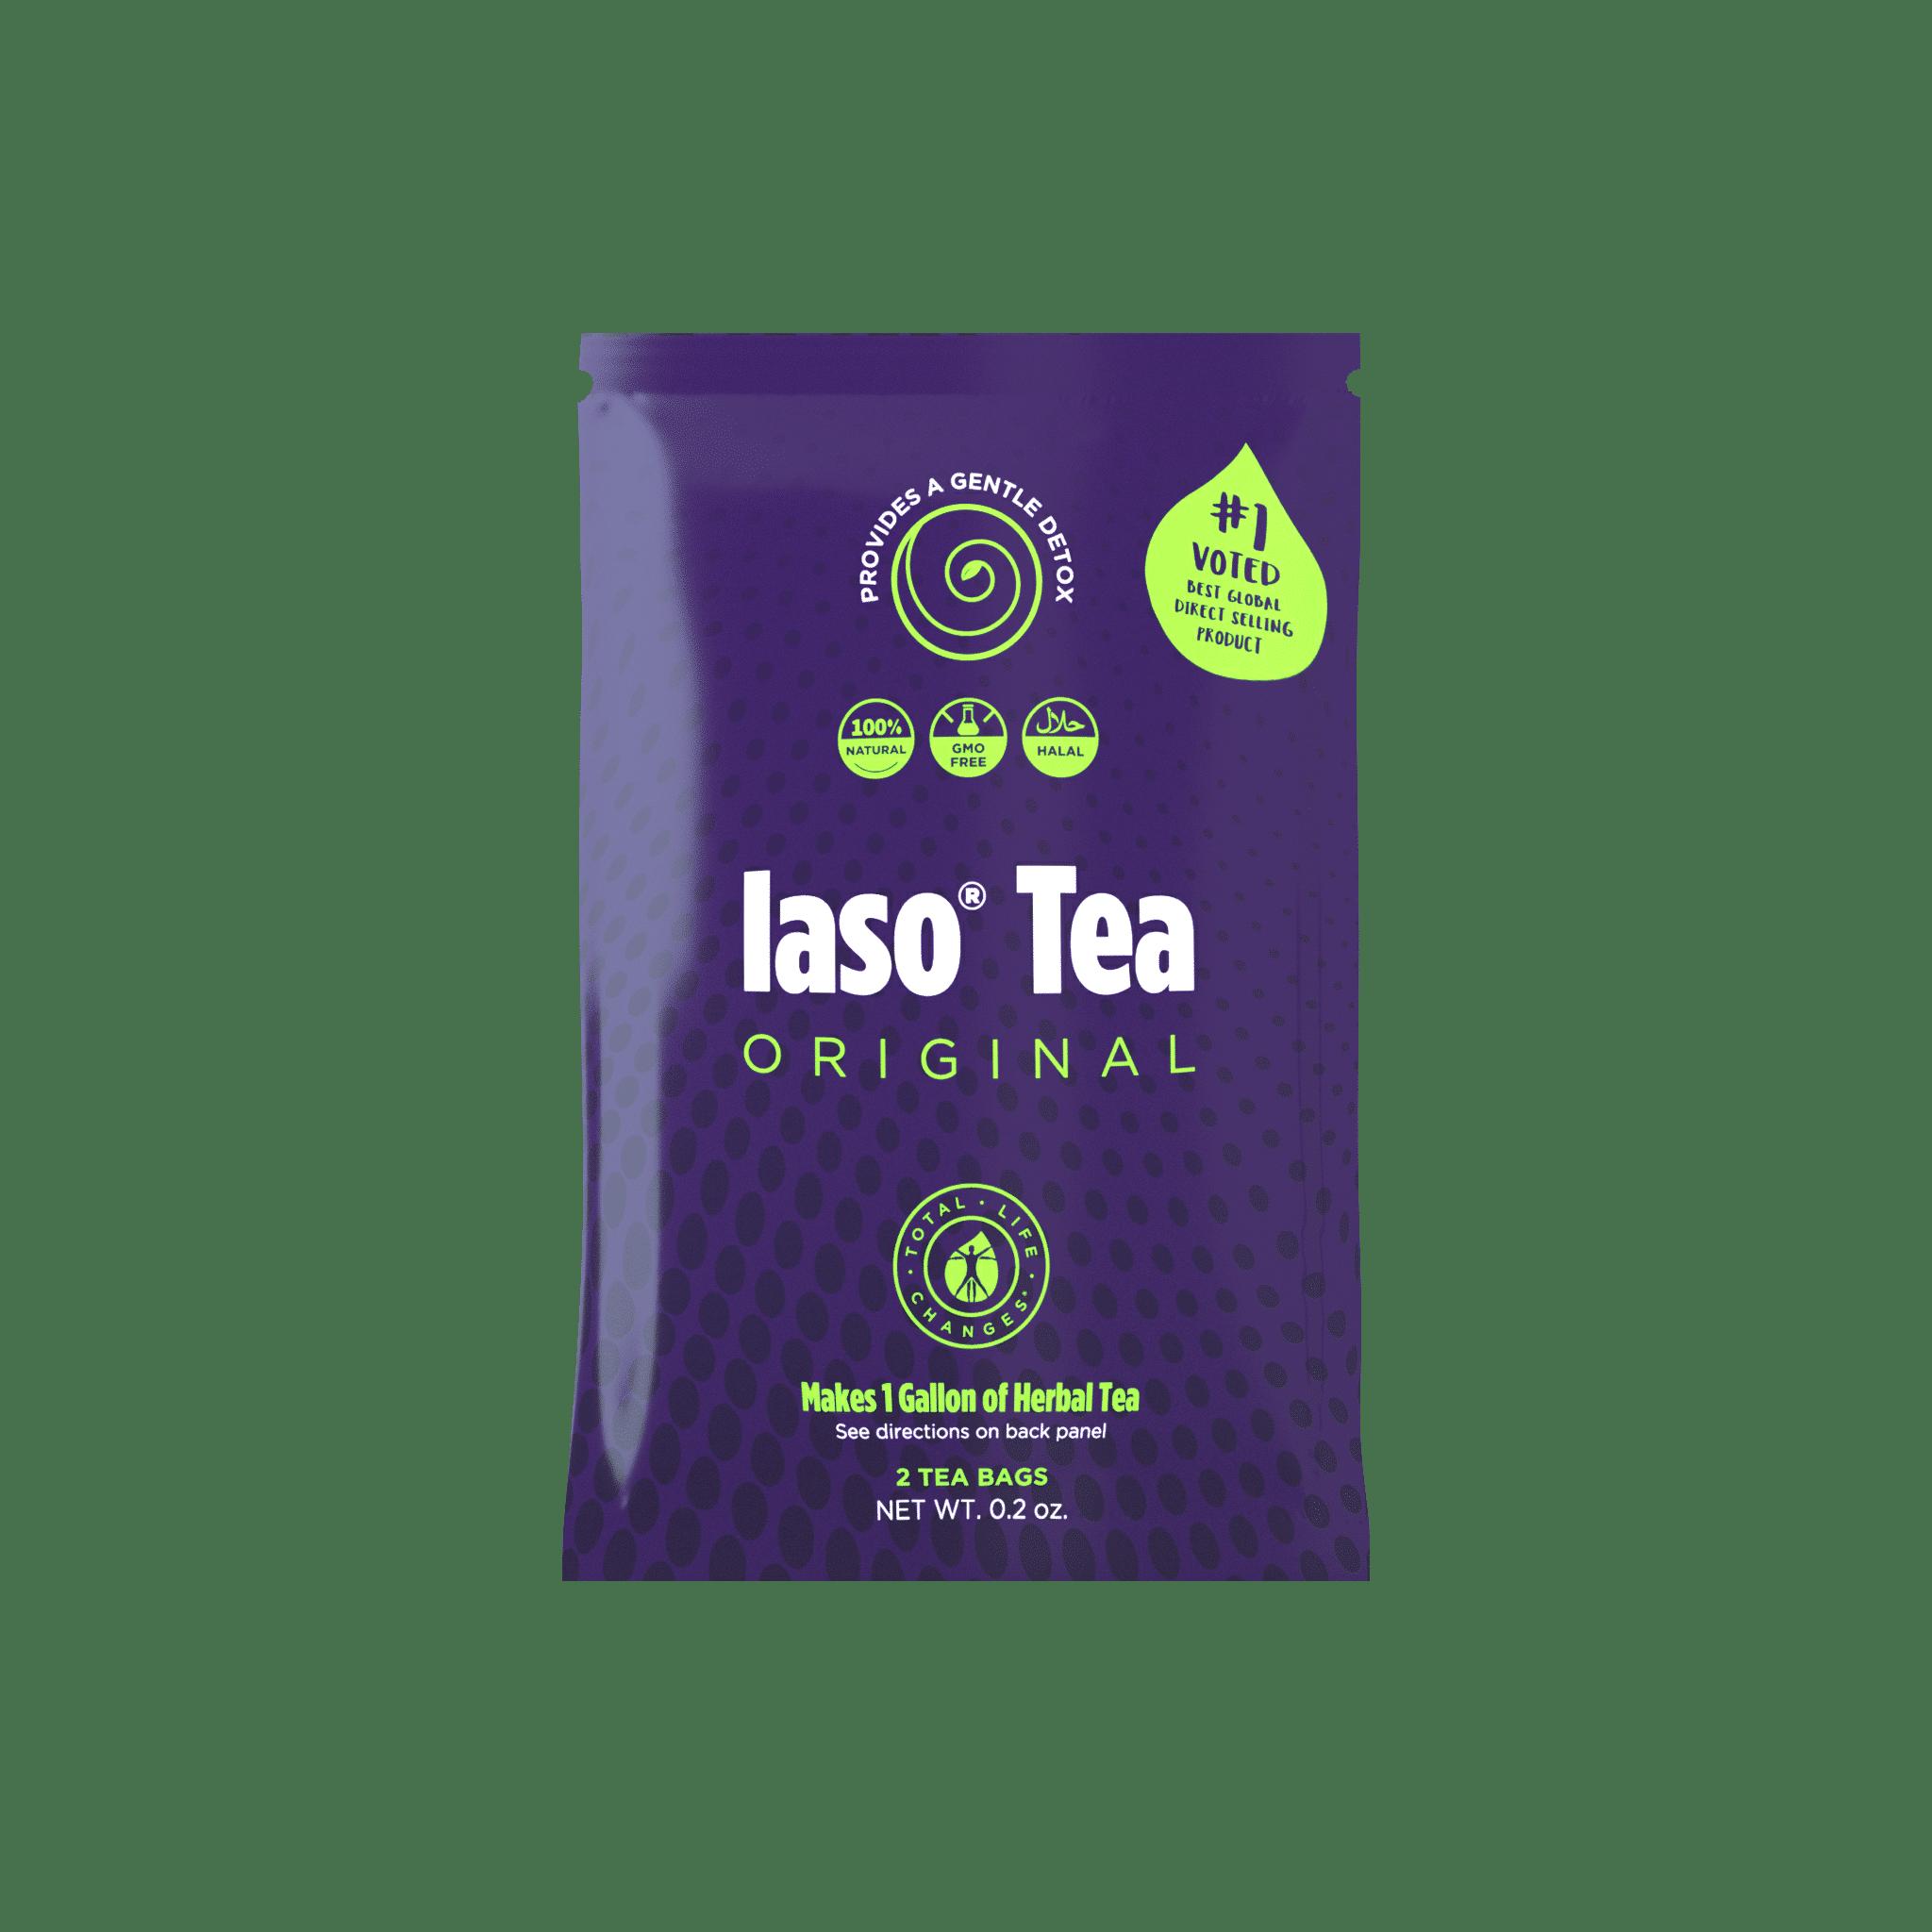 Iaso® Tea Package Front